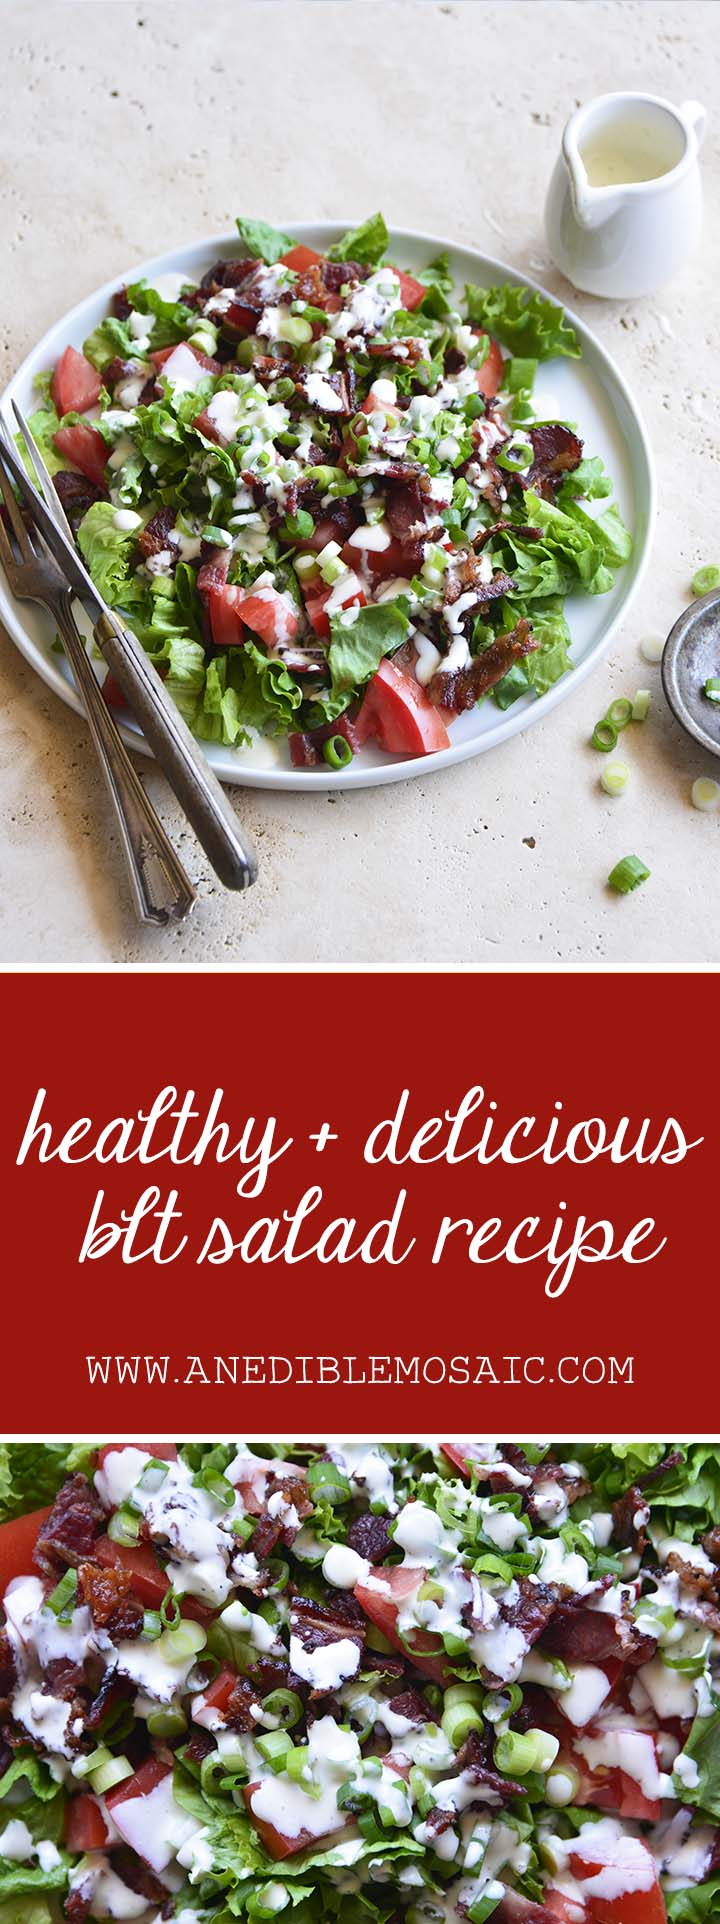 Healthy and Delicious BLT Salad Recipe Pin